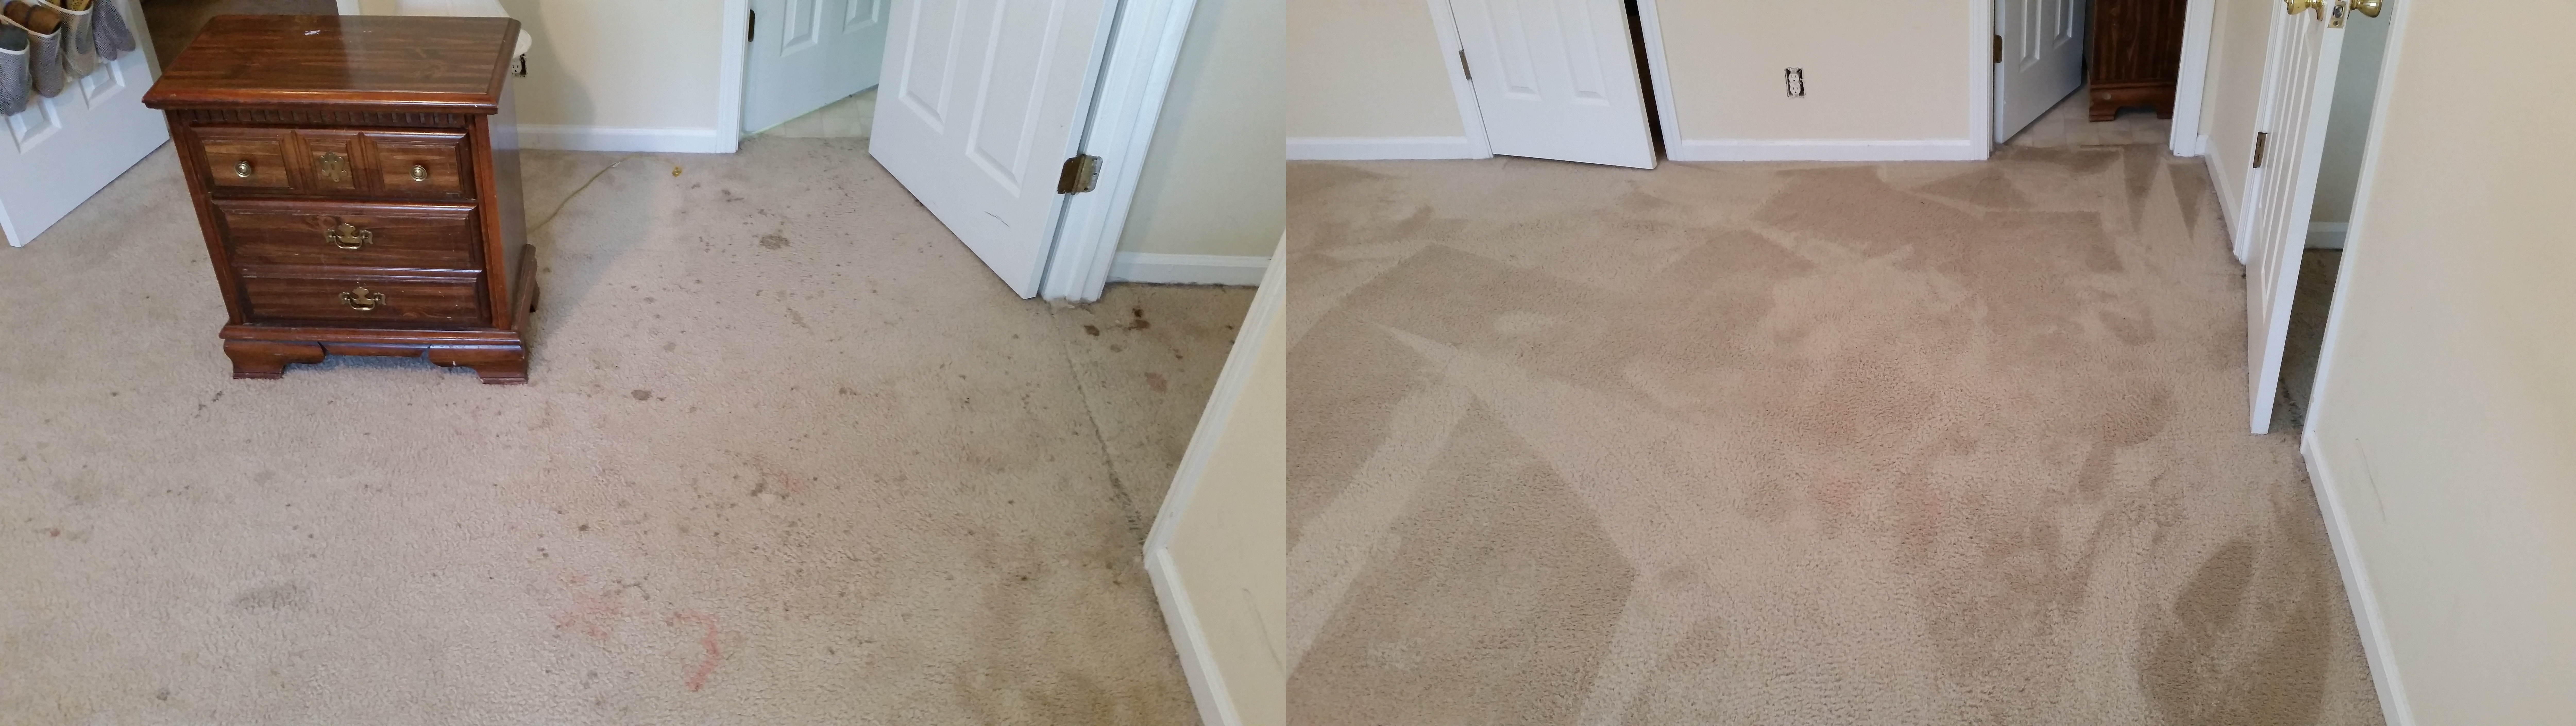 11-10-14-b-a-citrusolution-carpet-cleaning-suwanee-7